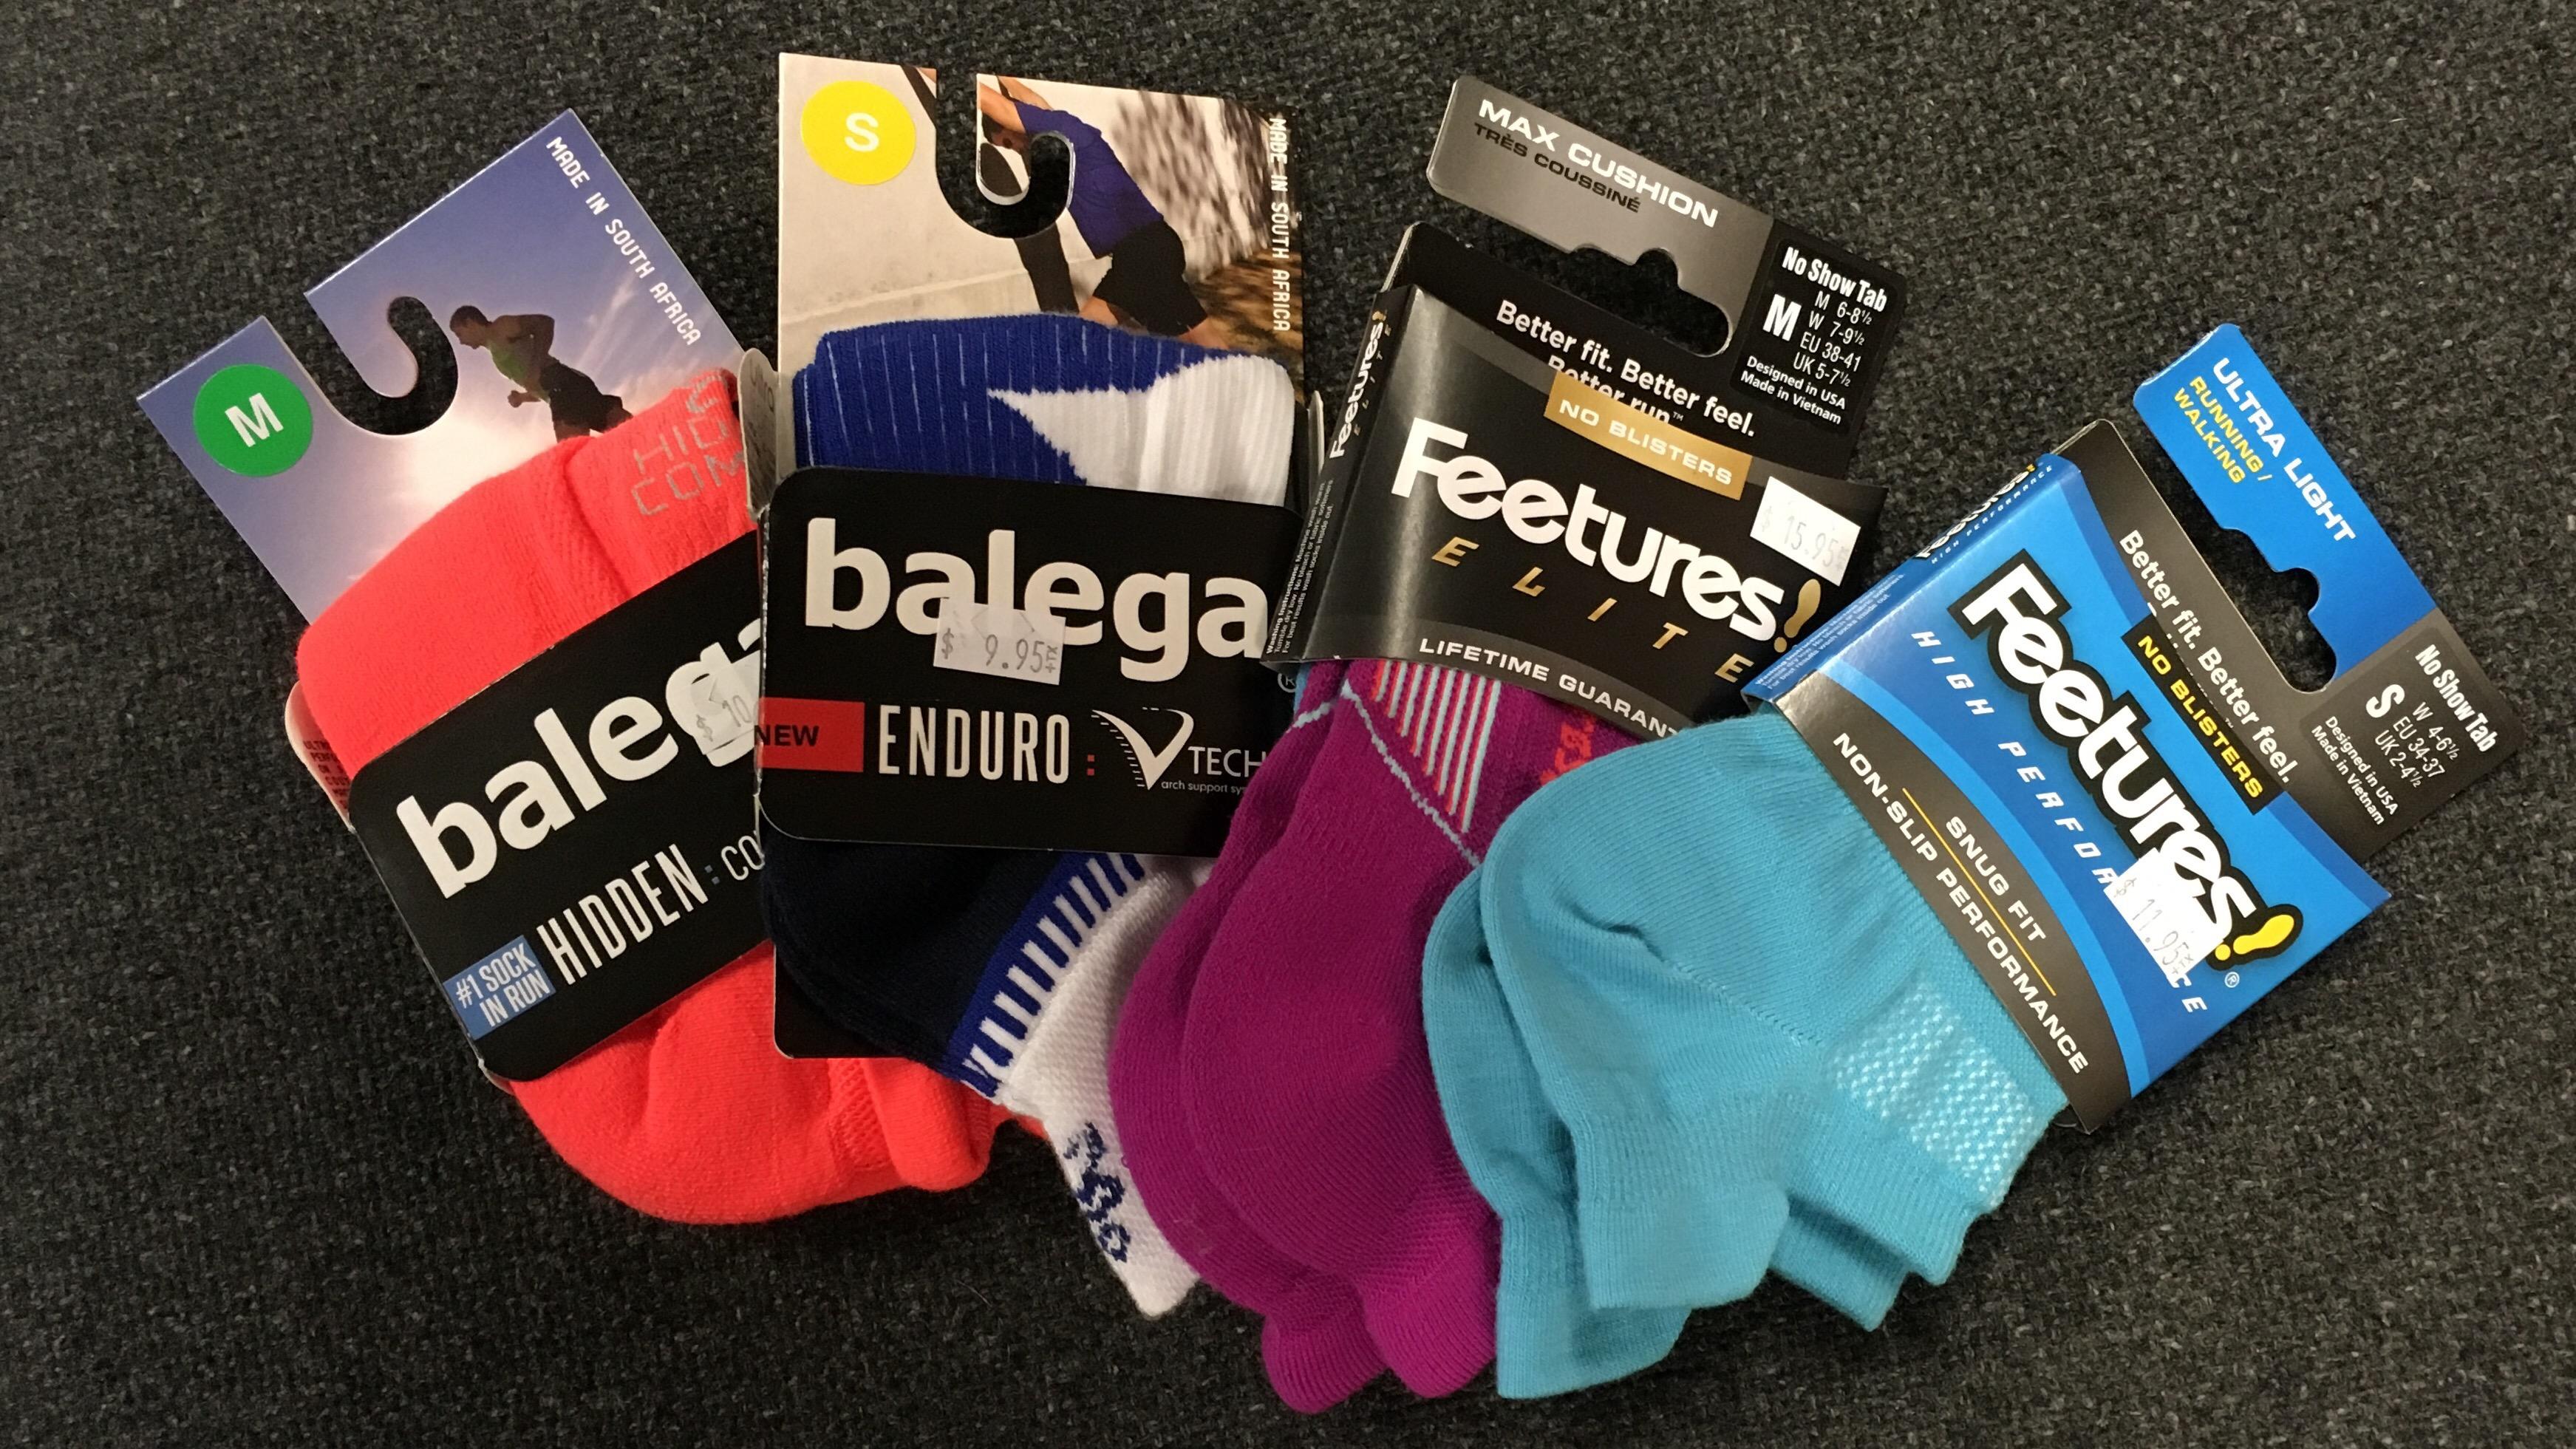 light balega running socks betatablight womens hidden run comforter comfort beta tab fusion stance